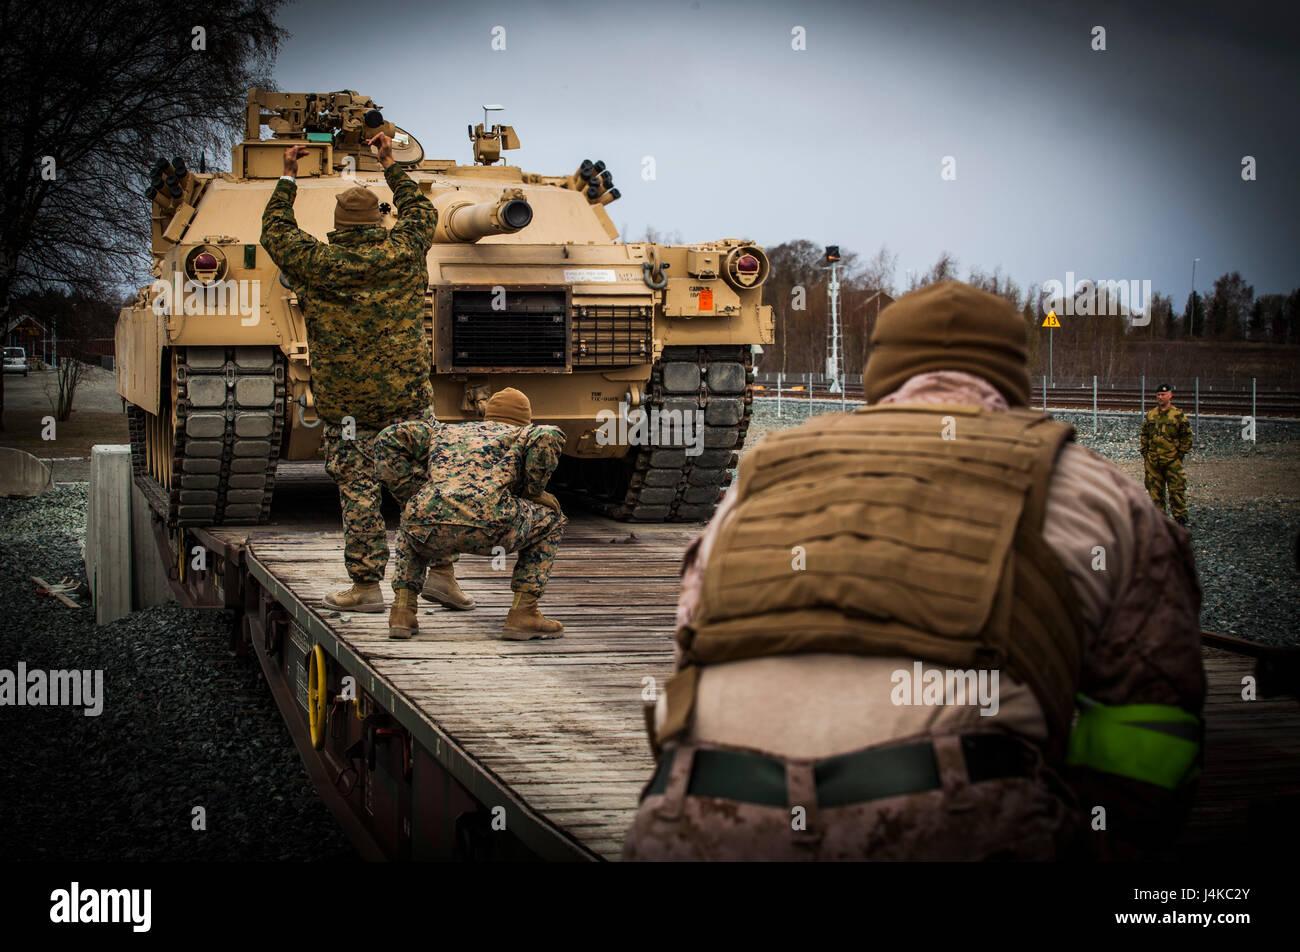 U.S. Marines with 2nd Transportation Support Battalion, Combat Logistics Regiment 2, 2nd Marine Logistics Group, Stock Photo